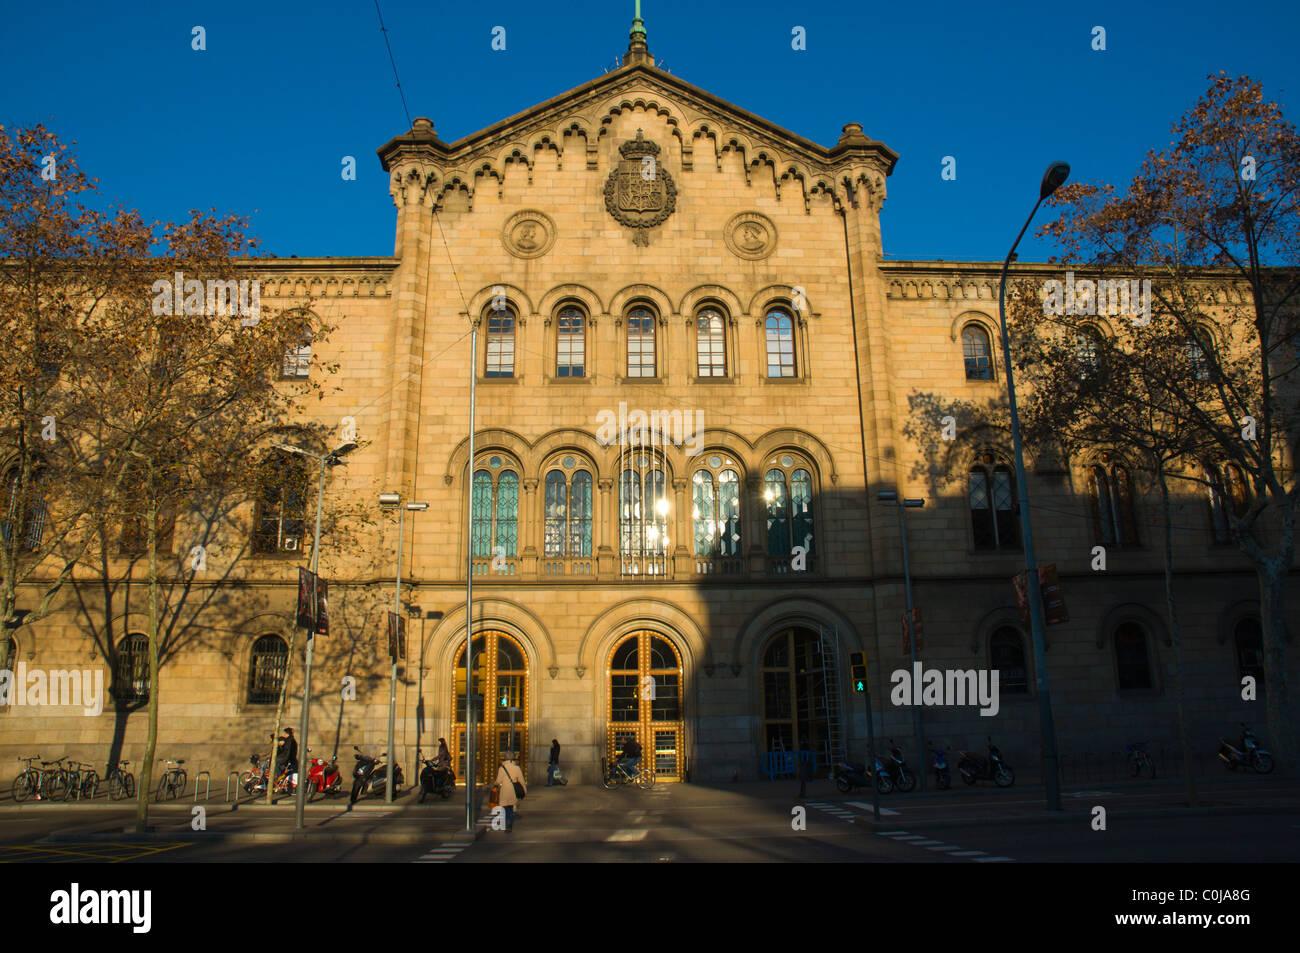 Universitat de Barcelona university building at Placa de la Universitat square central Barcelona Catalunya Spain - Stock Image